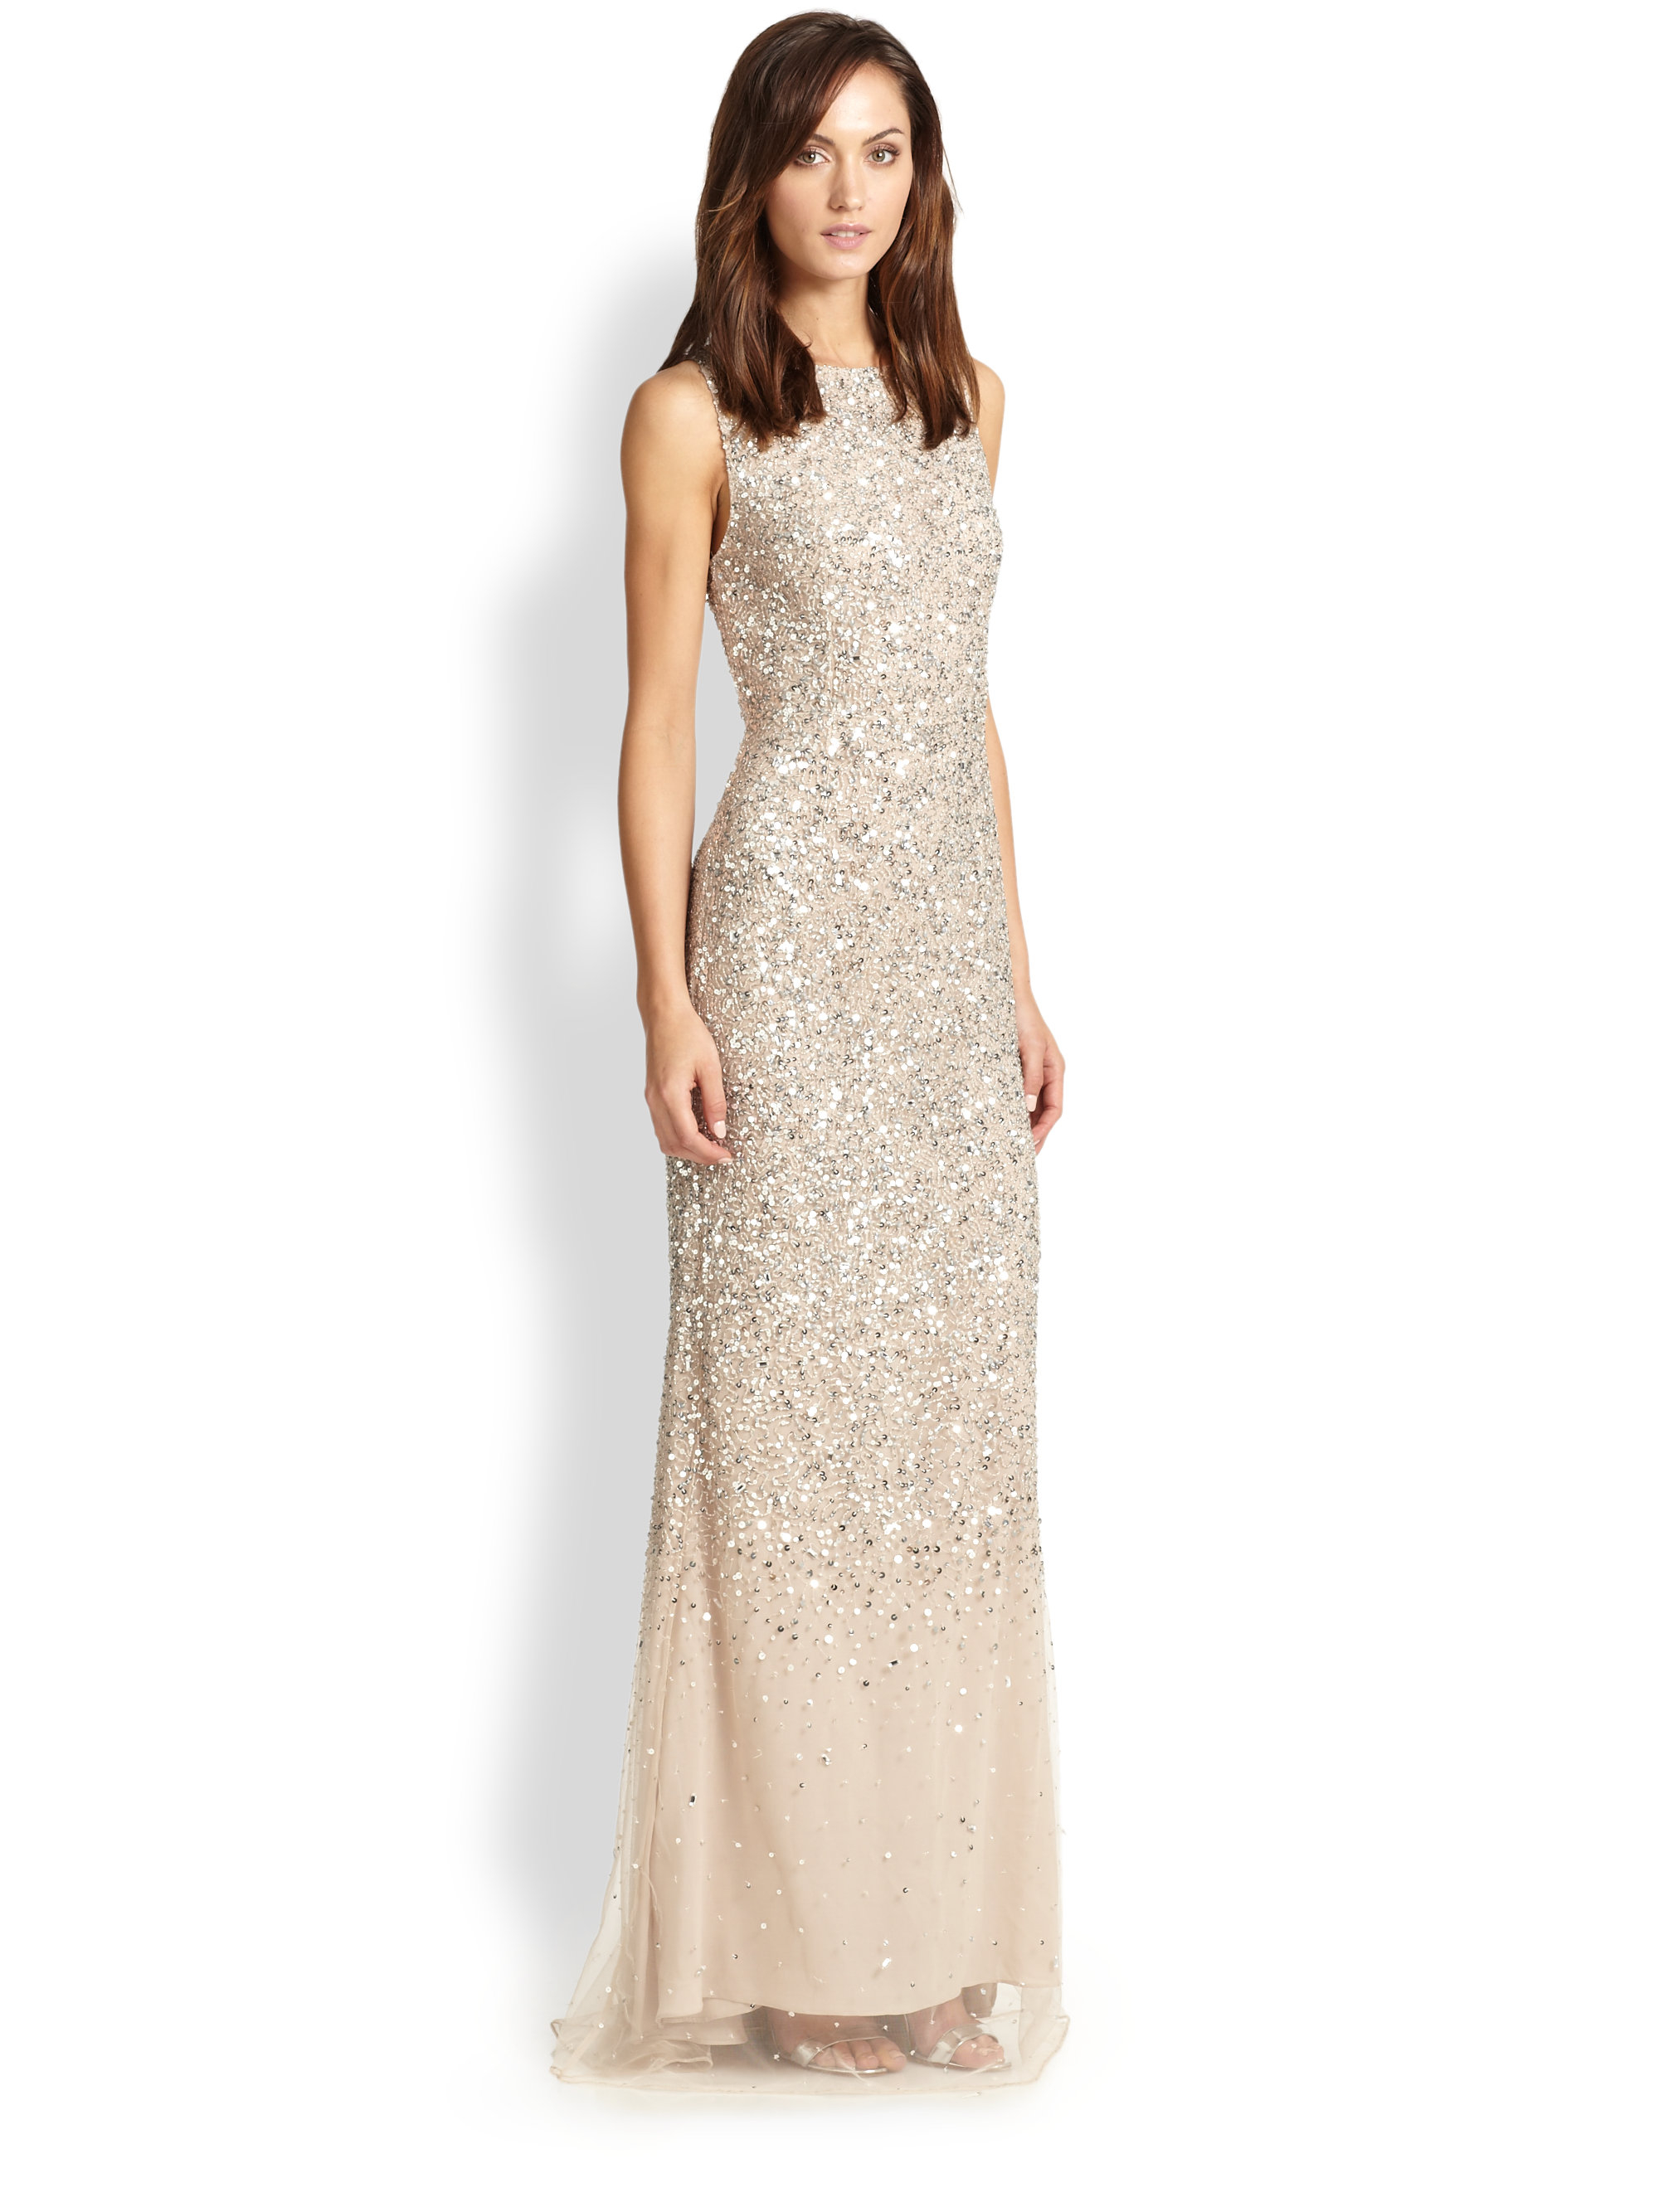 Lyst - Alice + Olivia Saba Embellished Gown in Natural